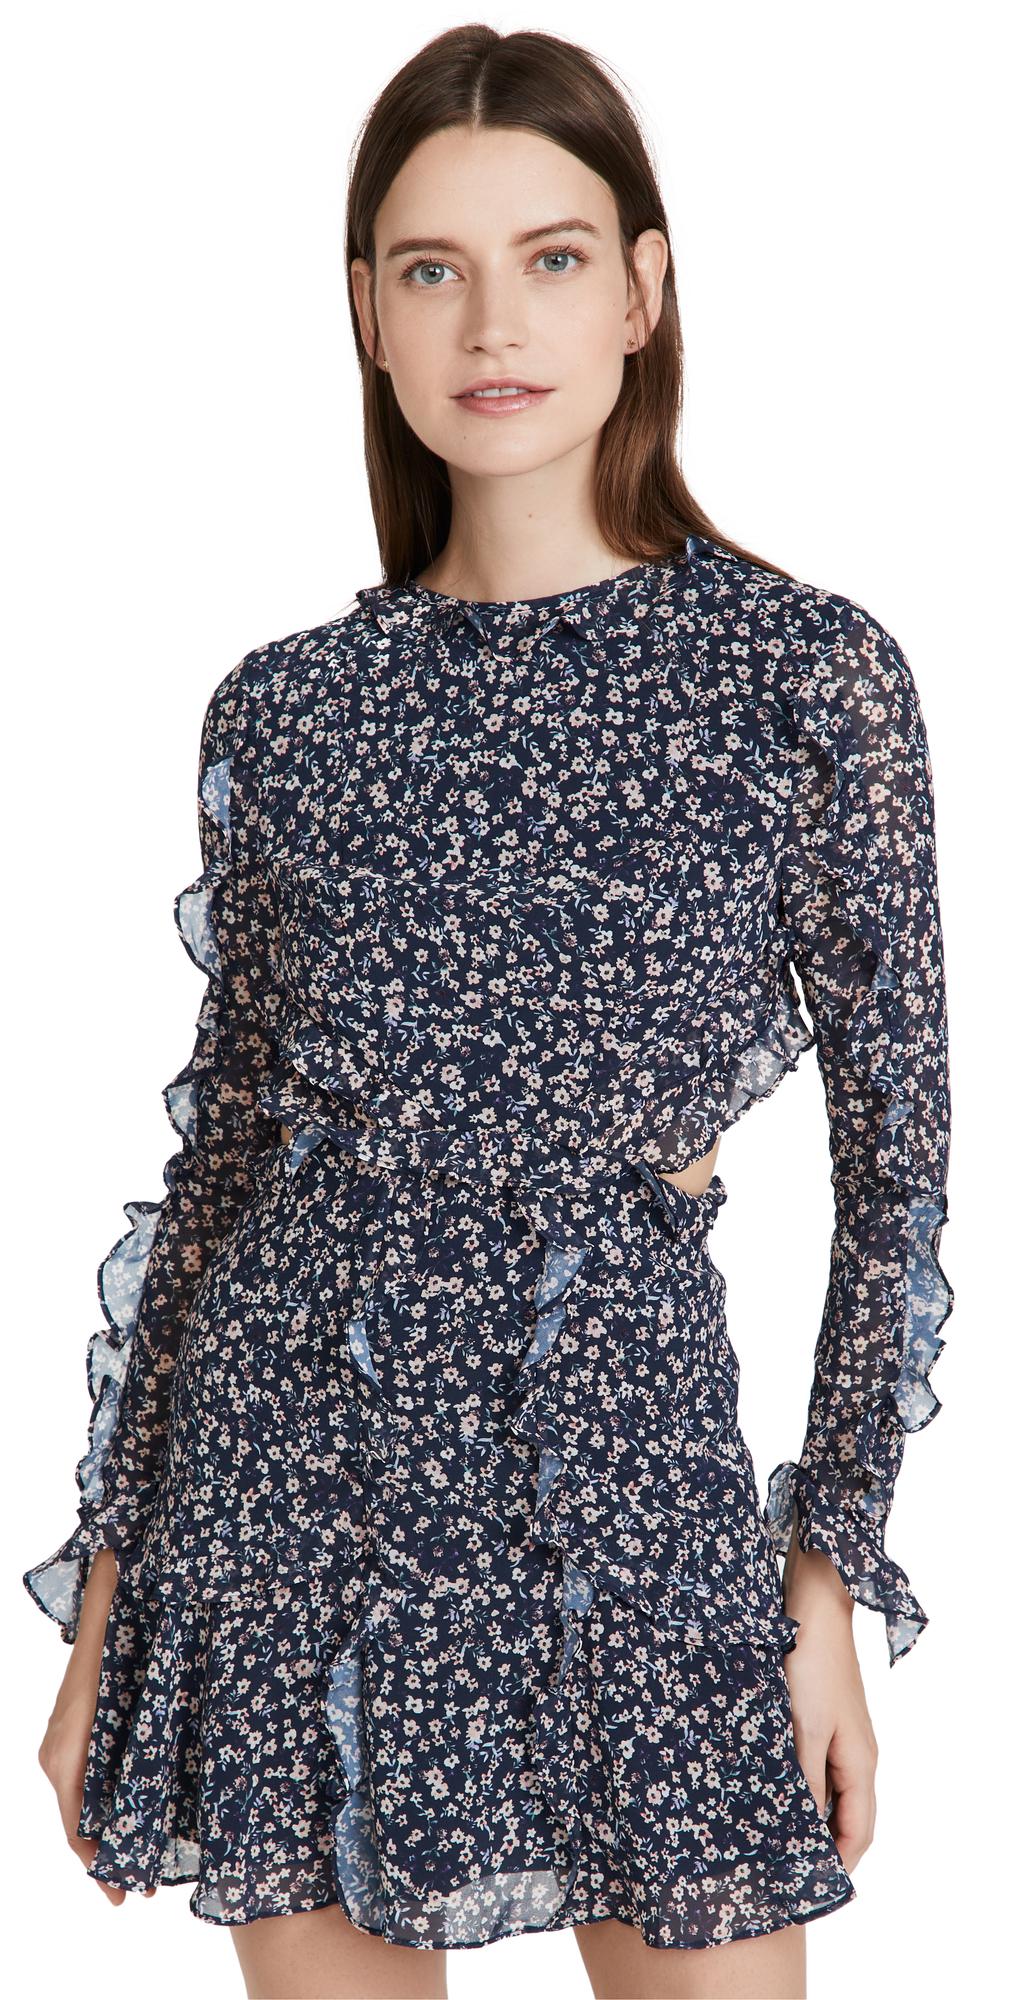 The Kye Dress